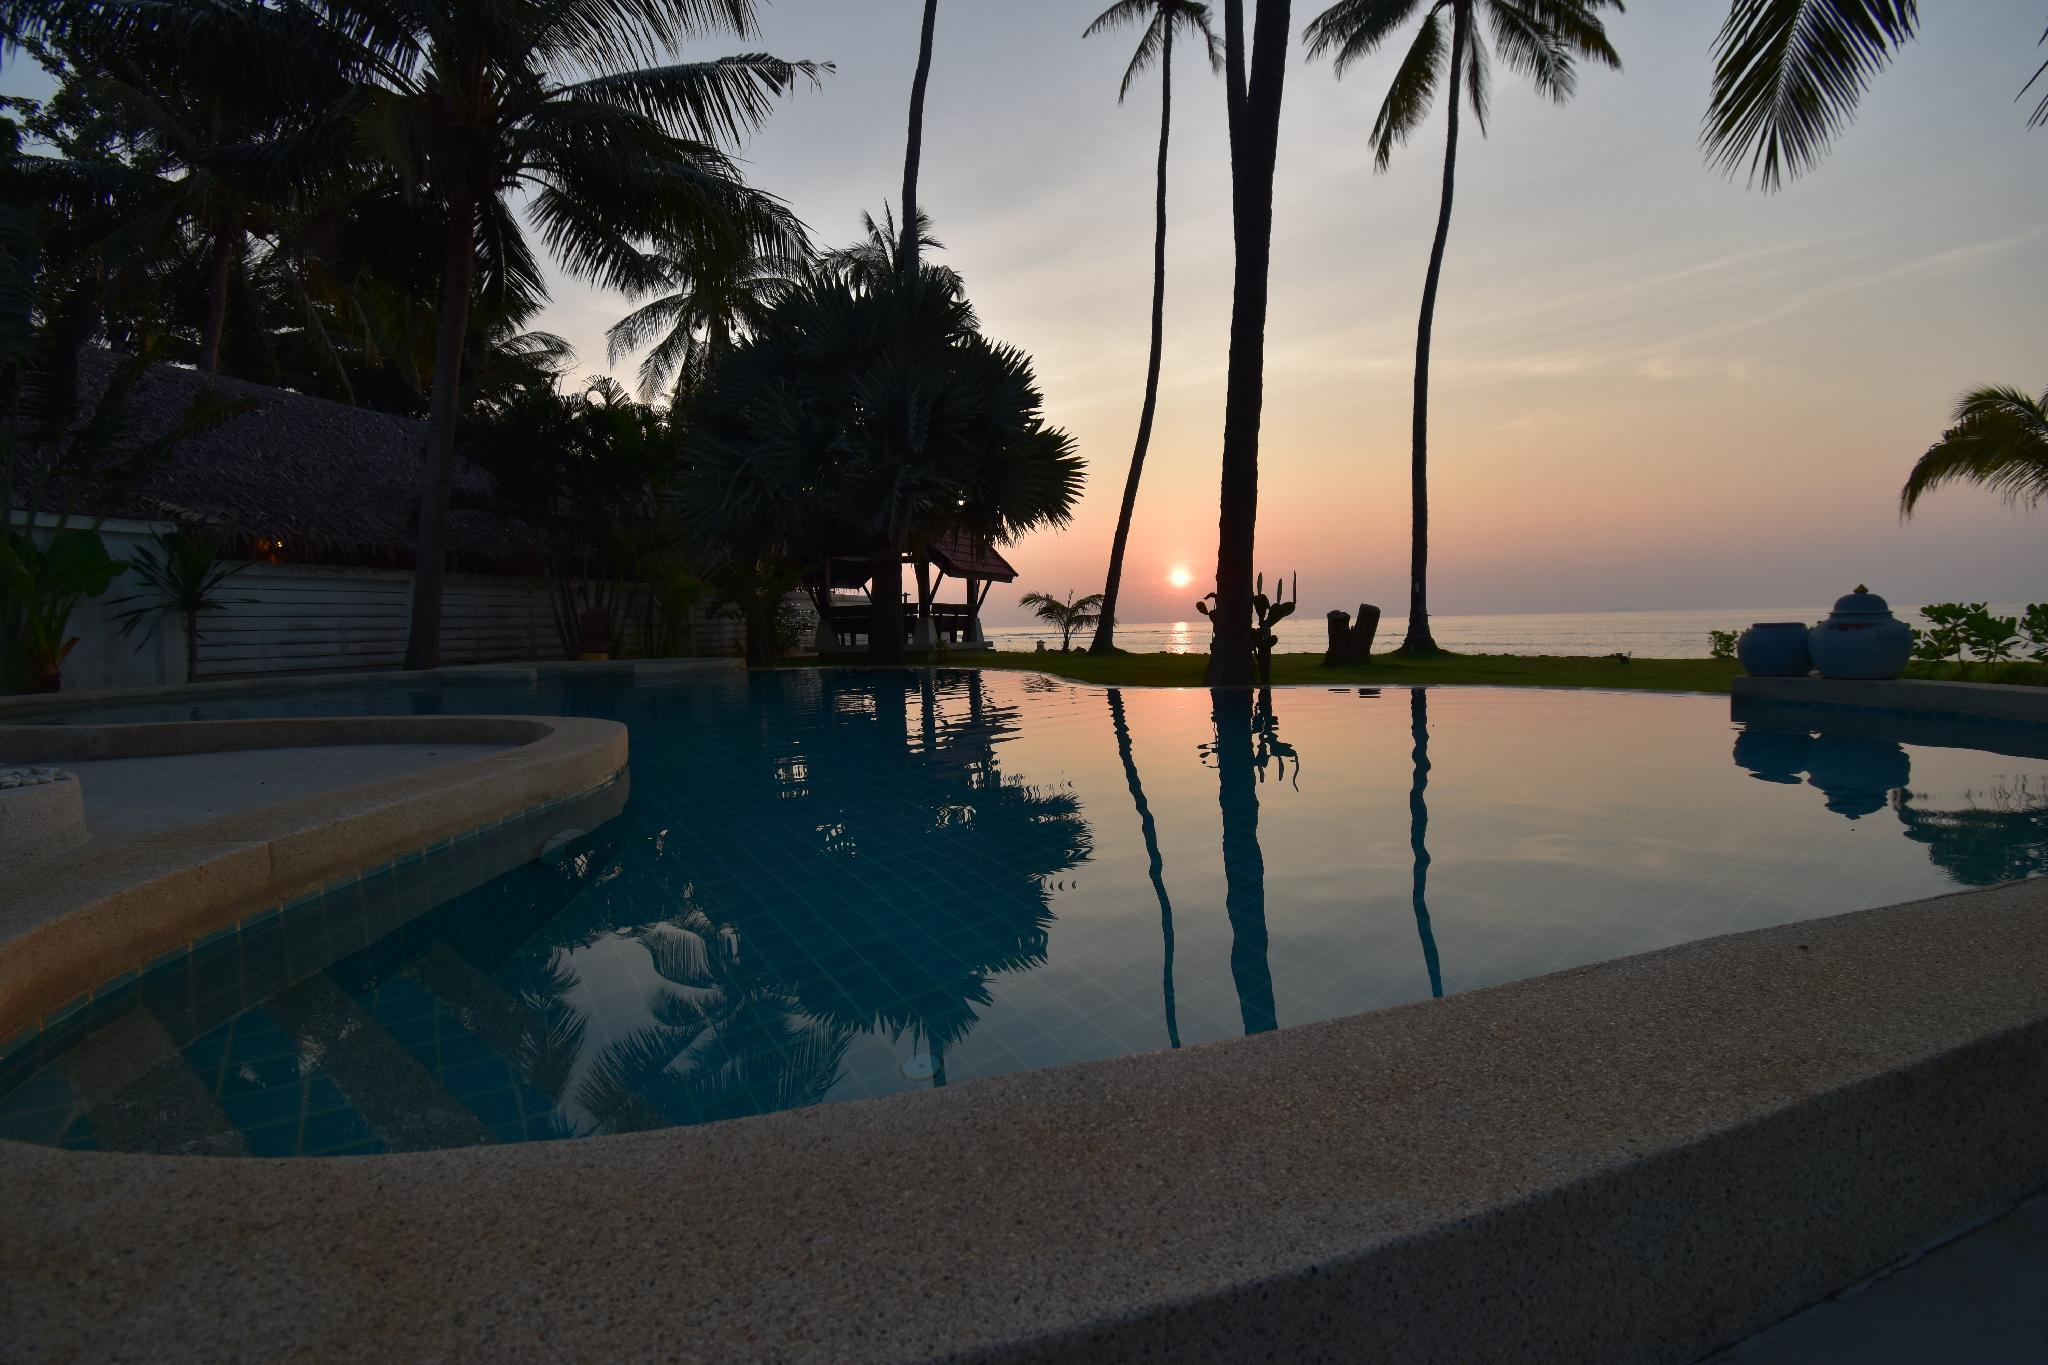 Beachfront villa with pool - Malee Beach Villa E1 วิลลา 5 ห้องนอน 2 ห้องน้ำส่วนตัว ขนาด 200 ตร.ม. – หาดพระแอะ